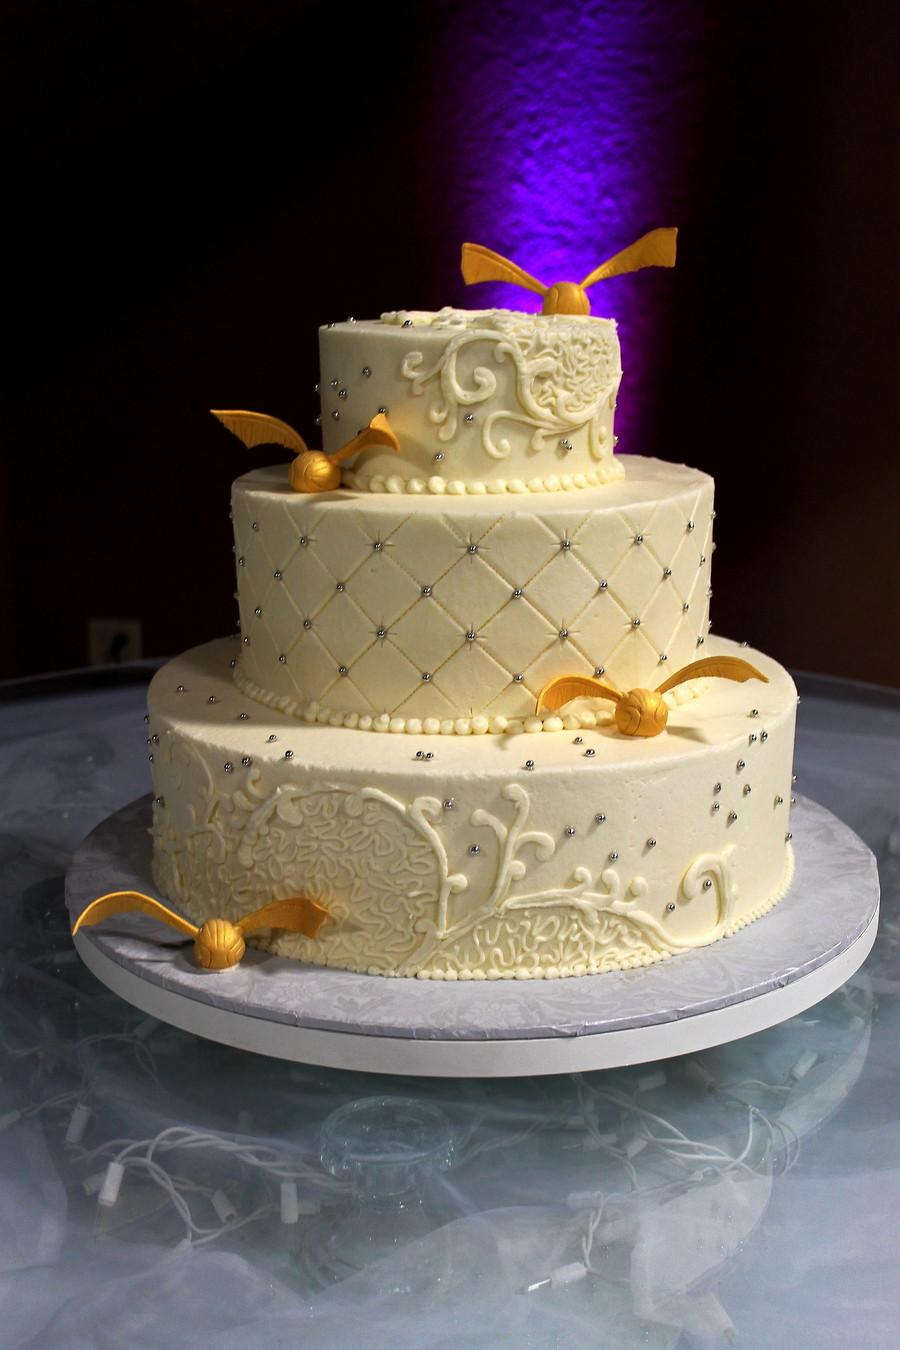 Harry Potter Wedding Cakes  Harry Potter Cake Harry Potter Wedding Cake Gold Snitch